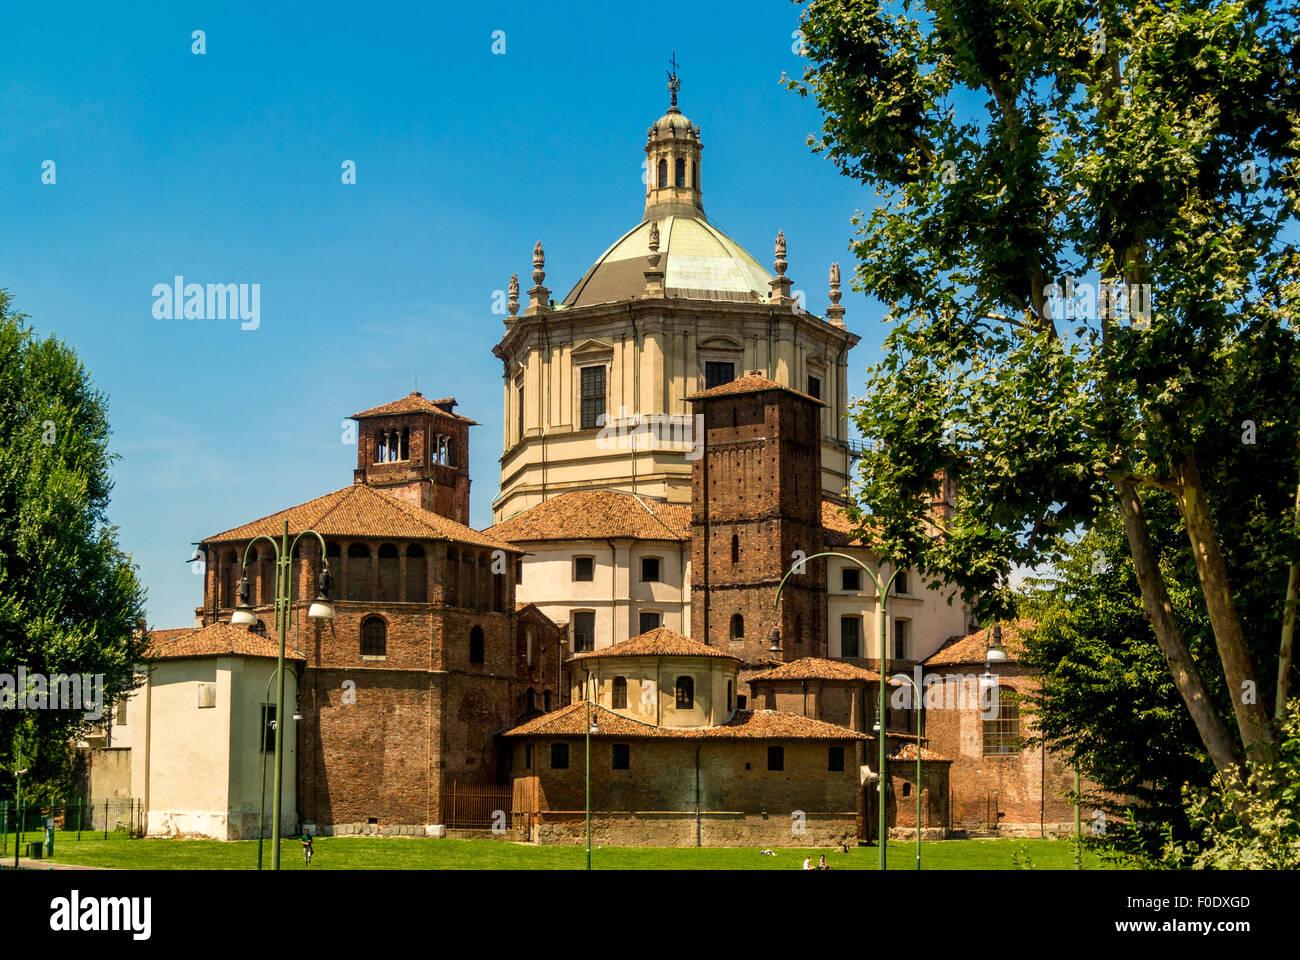 Basilicas Park (Parco delle Basiliche) with Basilica of San Lorenzo, Milan, Italy. - Stock Image